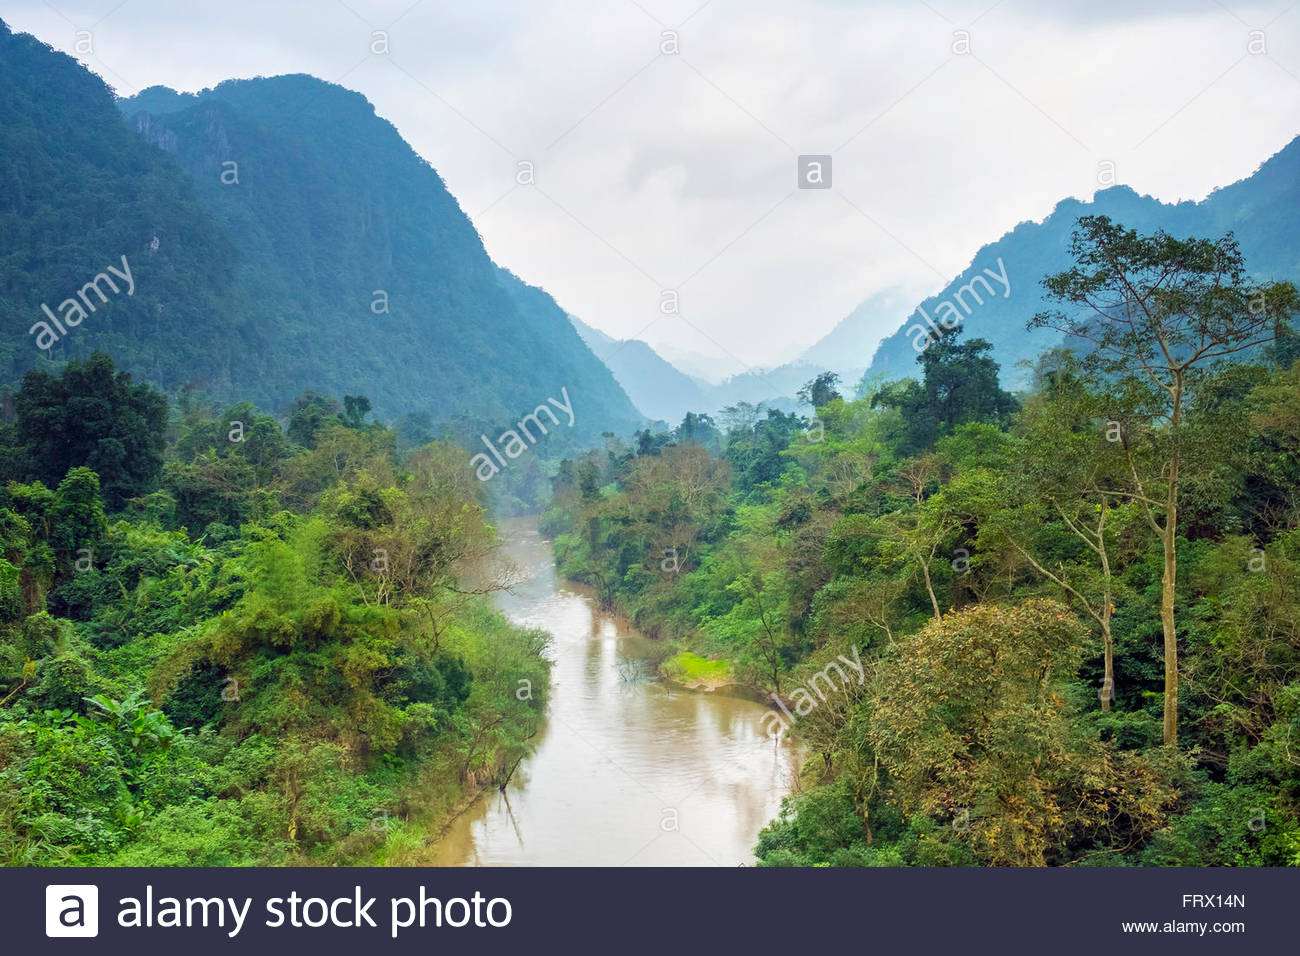 Jungle landscape in Phong Nha-Ke Bang National Park, Bo Trach District, Quang Binh Province, Vietnam - Stock Image